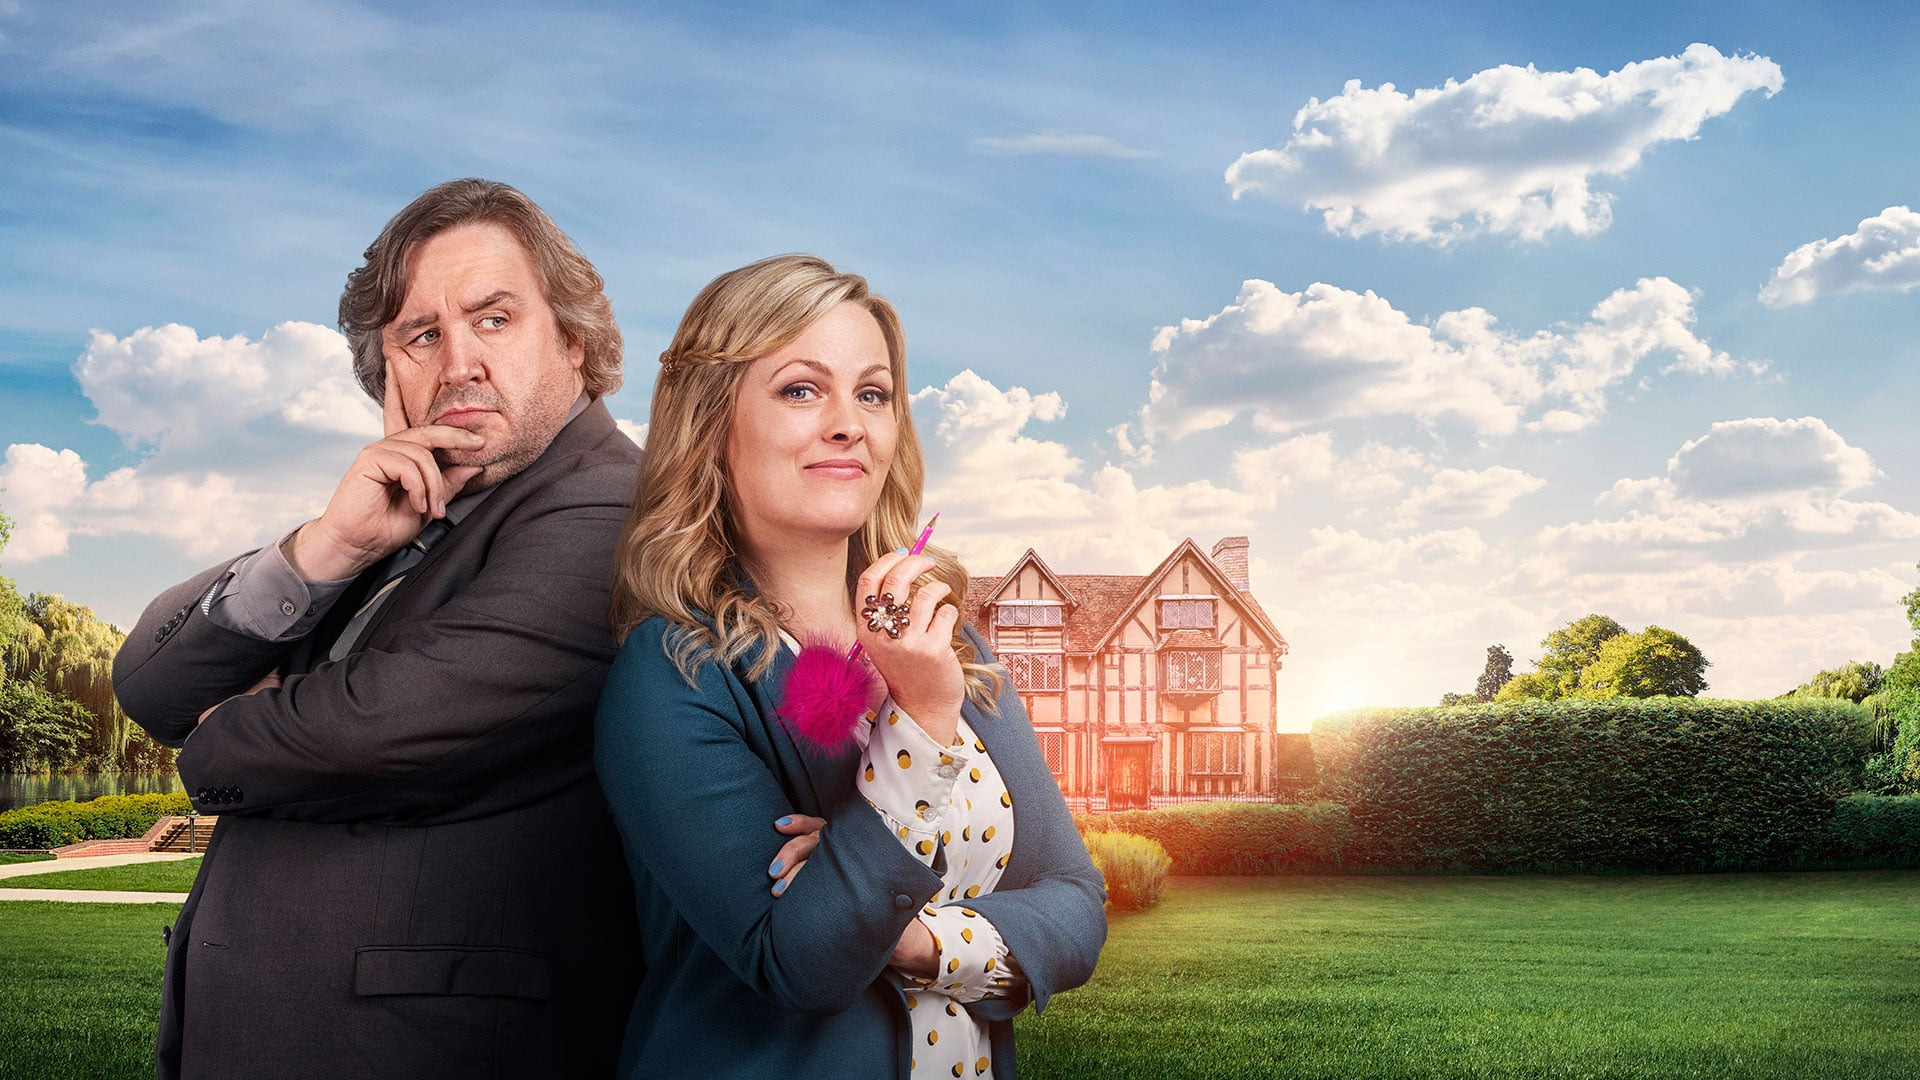 Show Shakespeare & Hathaway - Private Investigators